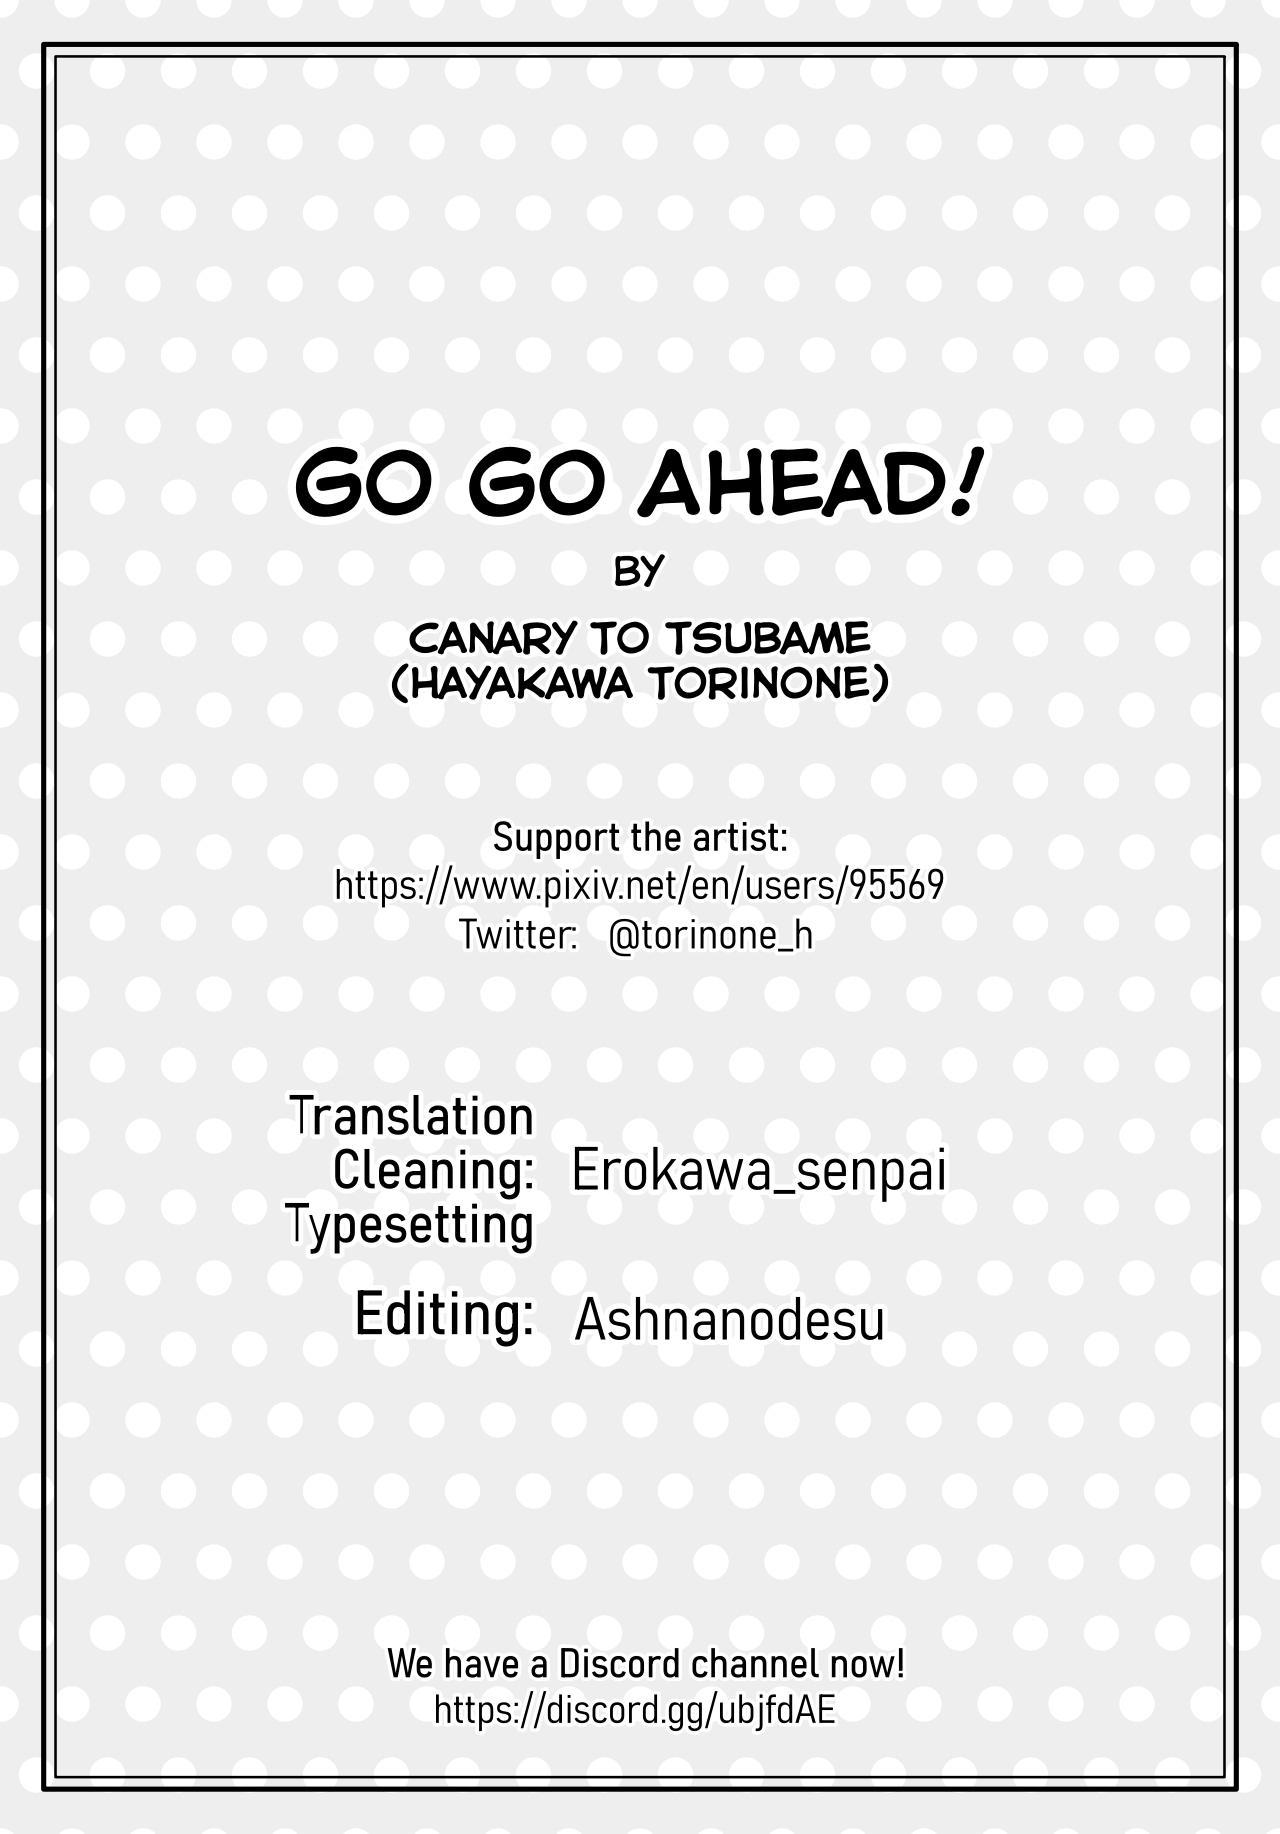 Go Go Ahead Canary To Tsubame 29